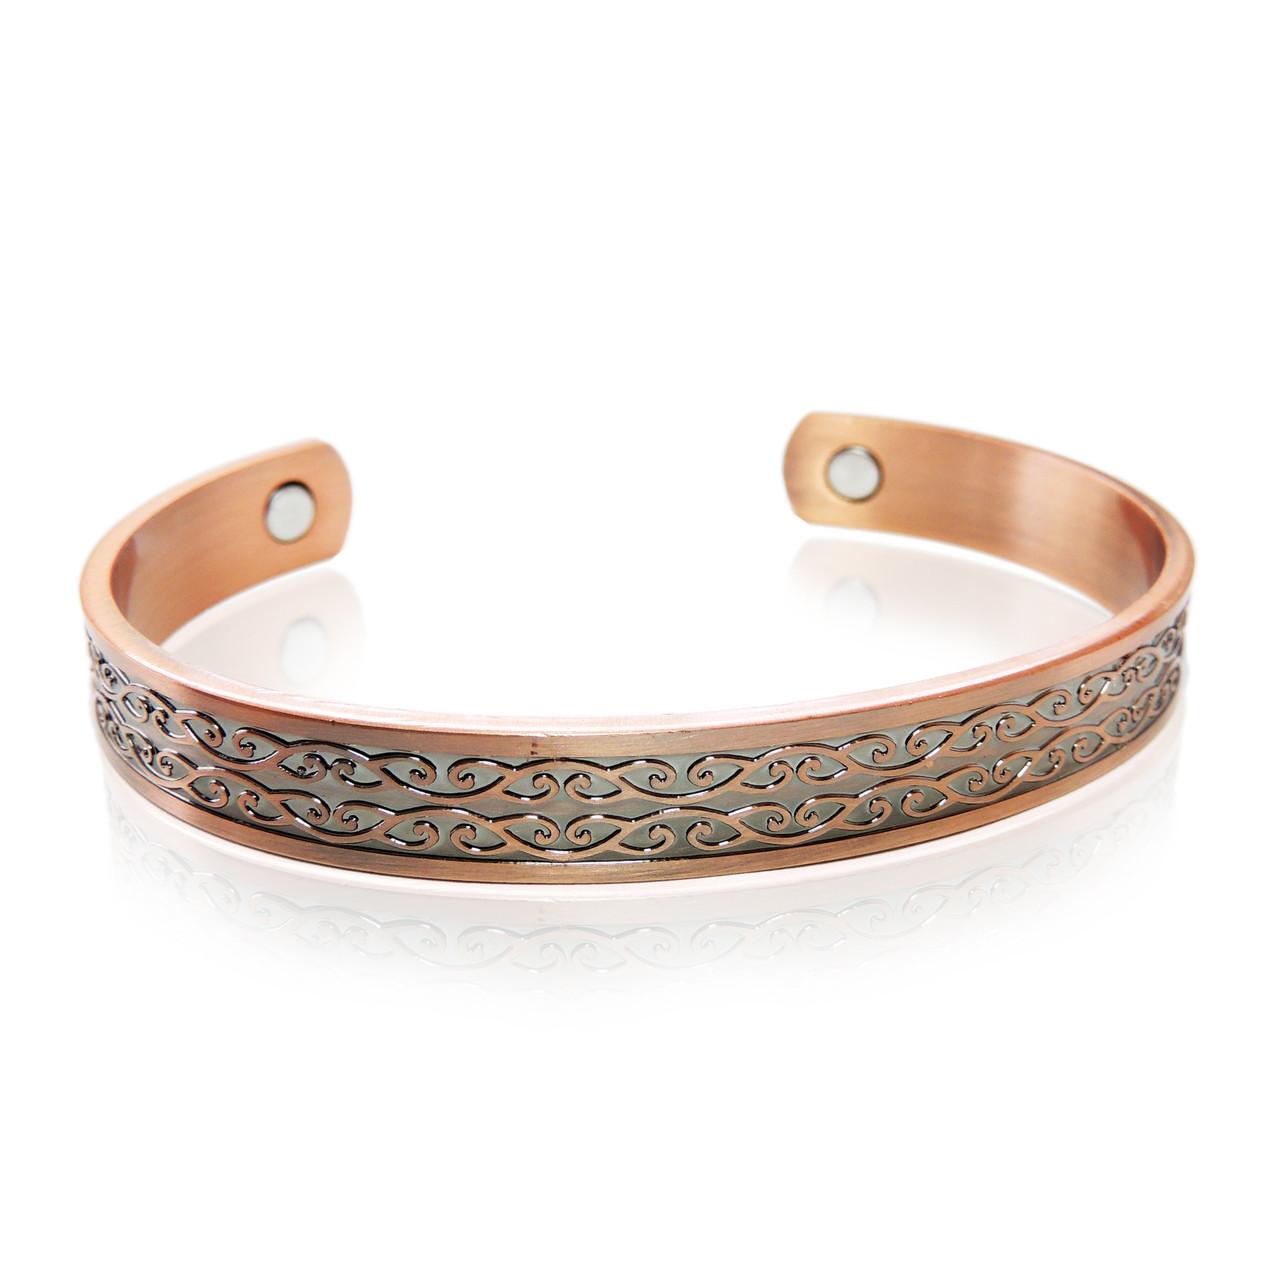 C-KCB024 Copper Bracelet